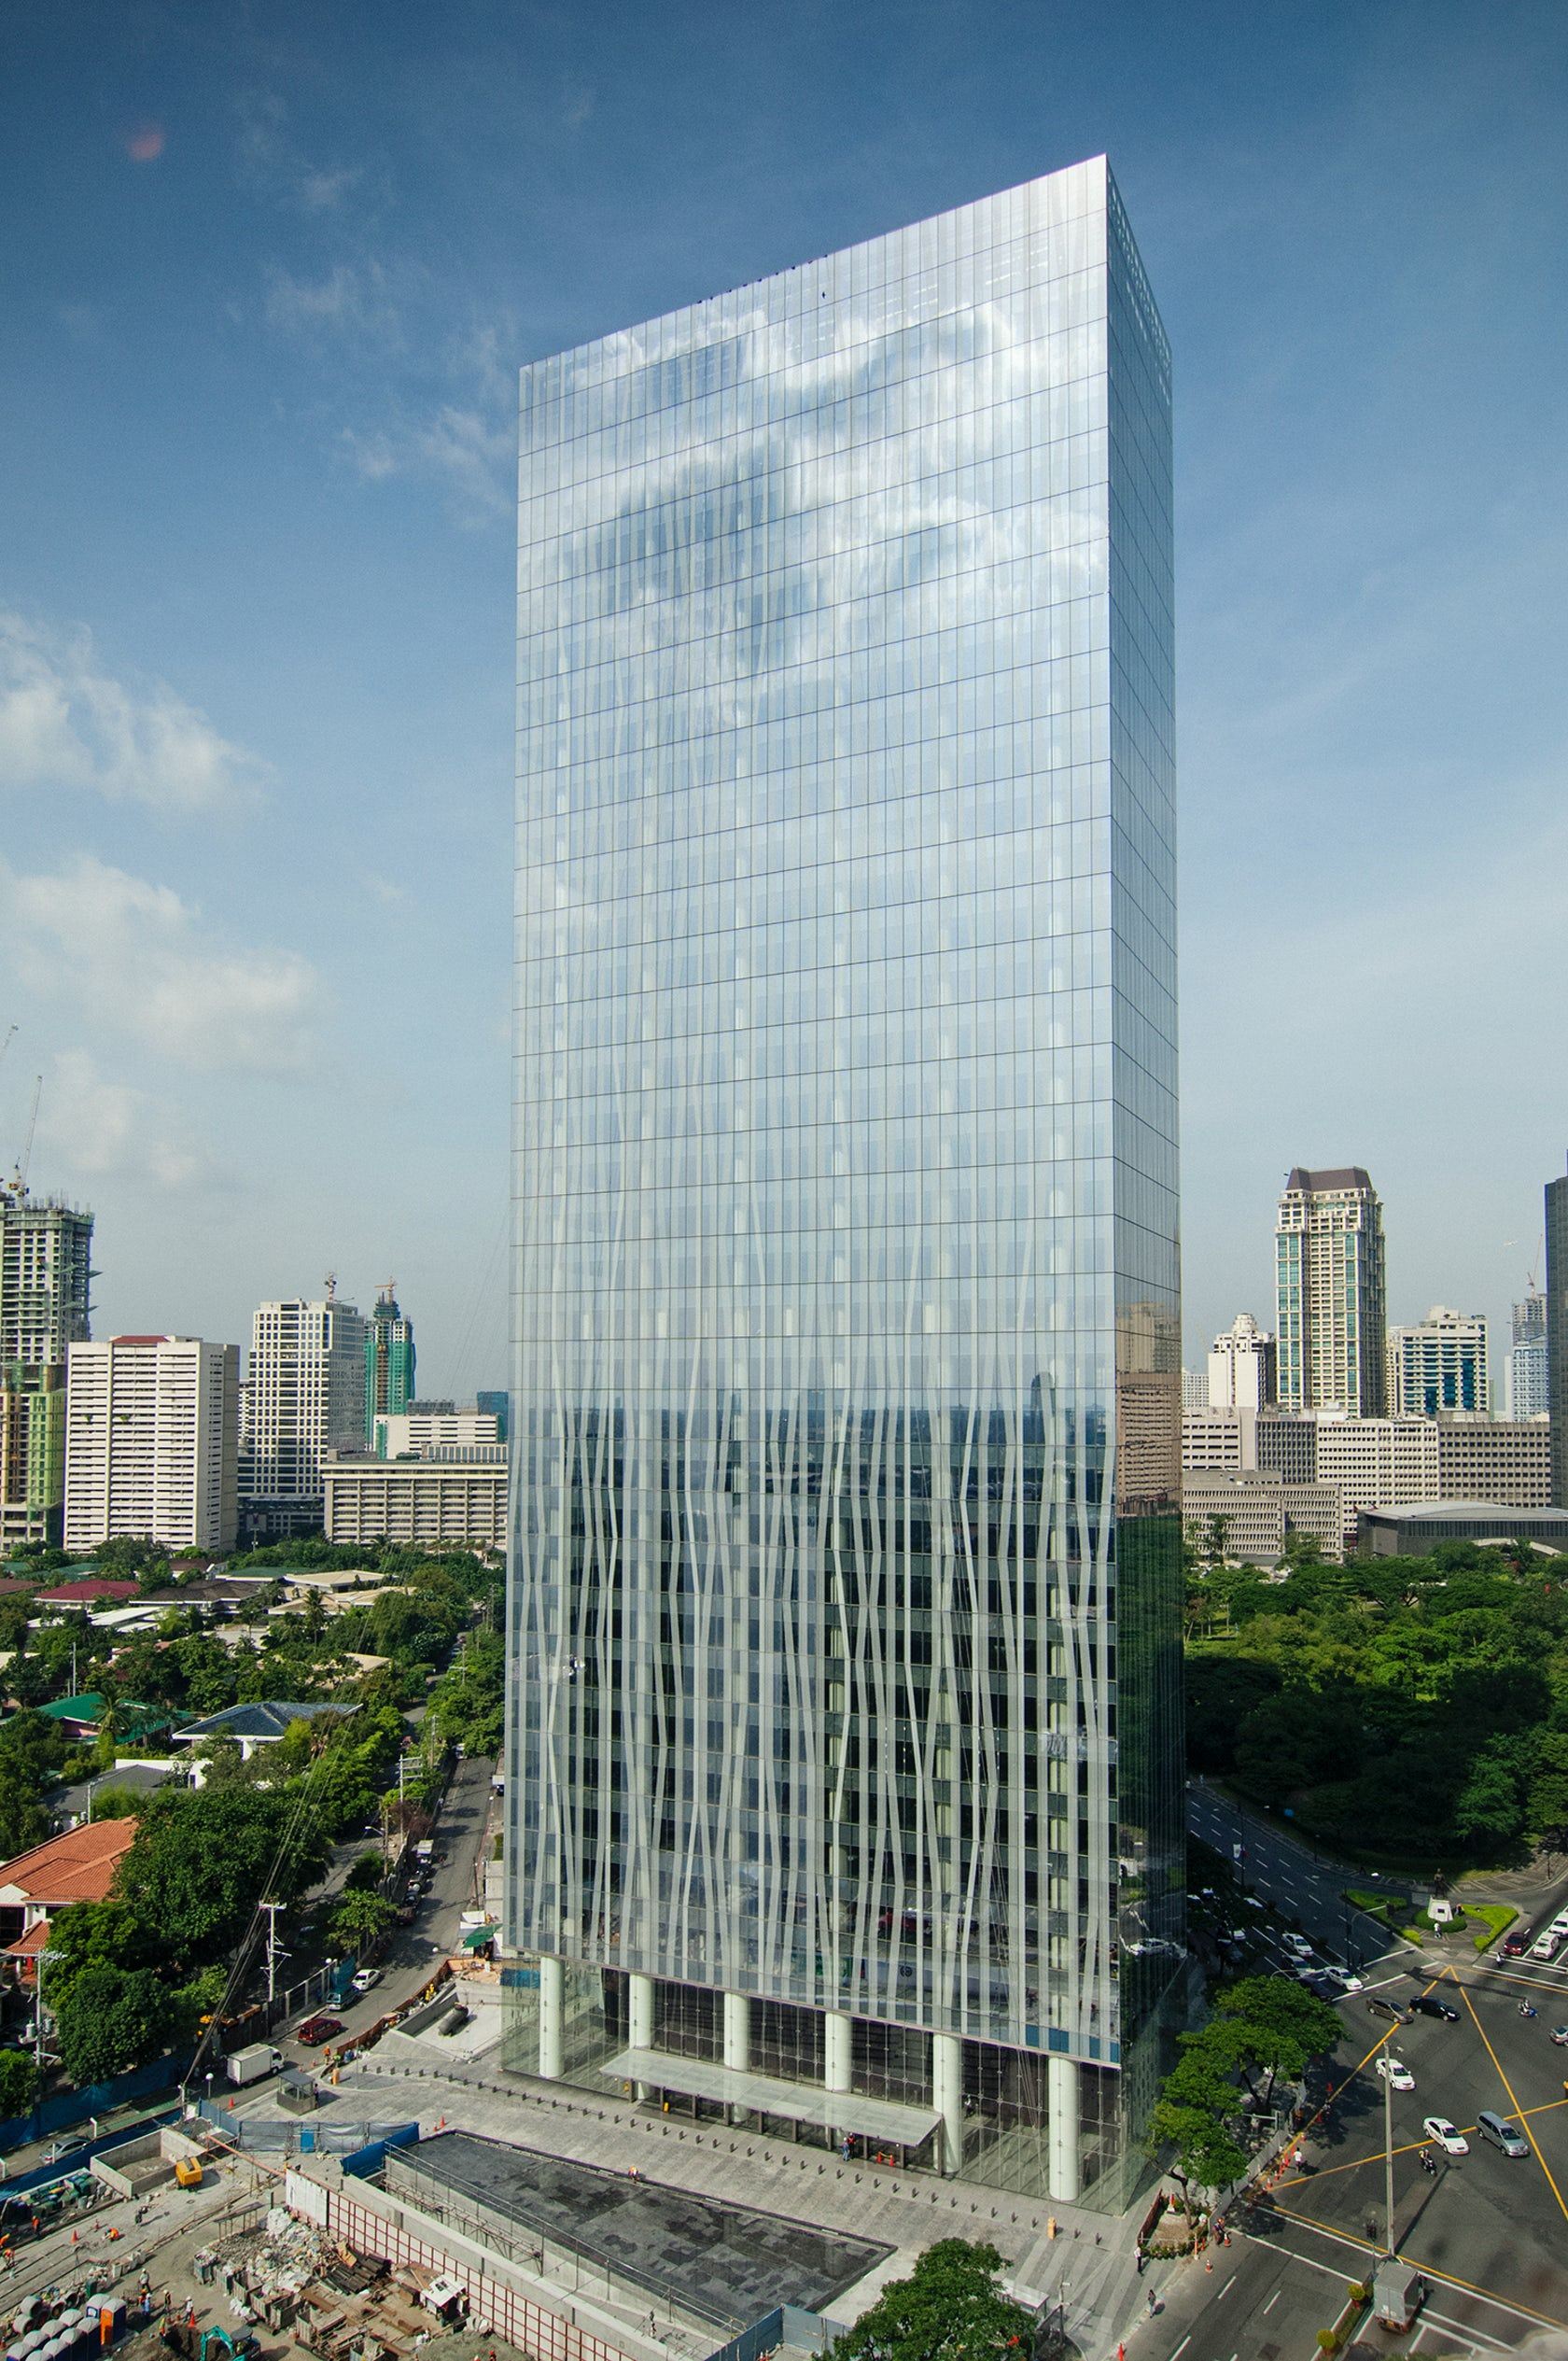 The Zuellig Building on Architizer